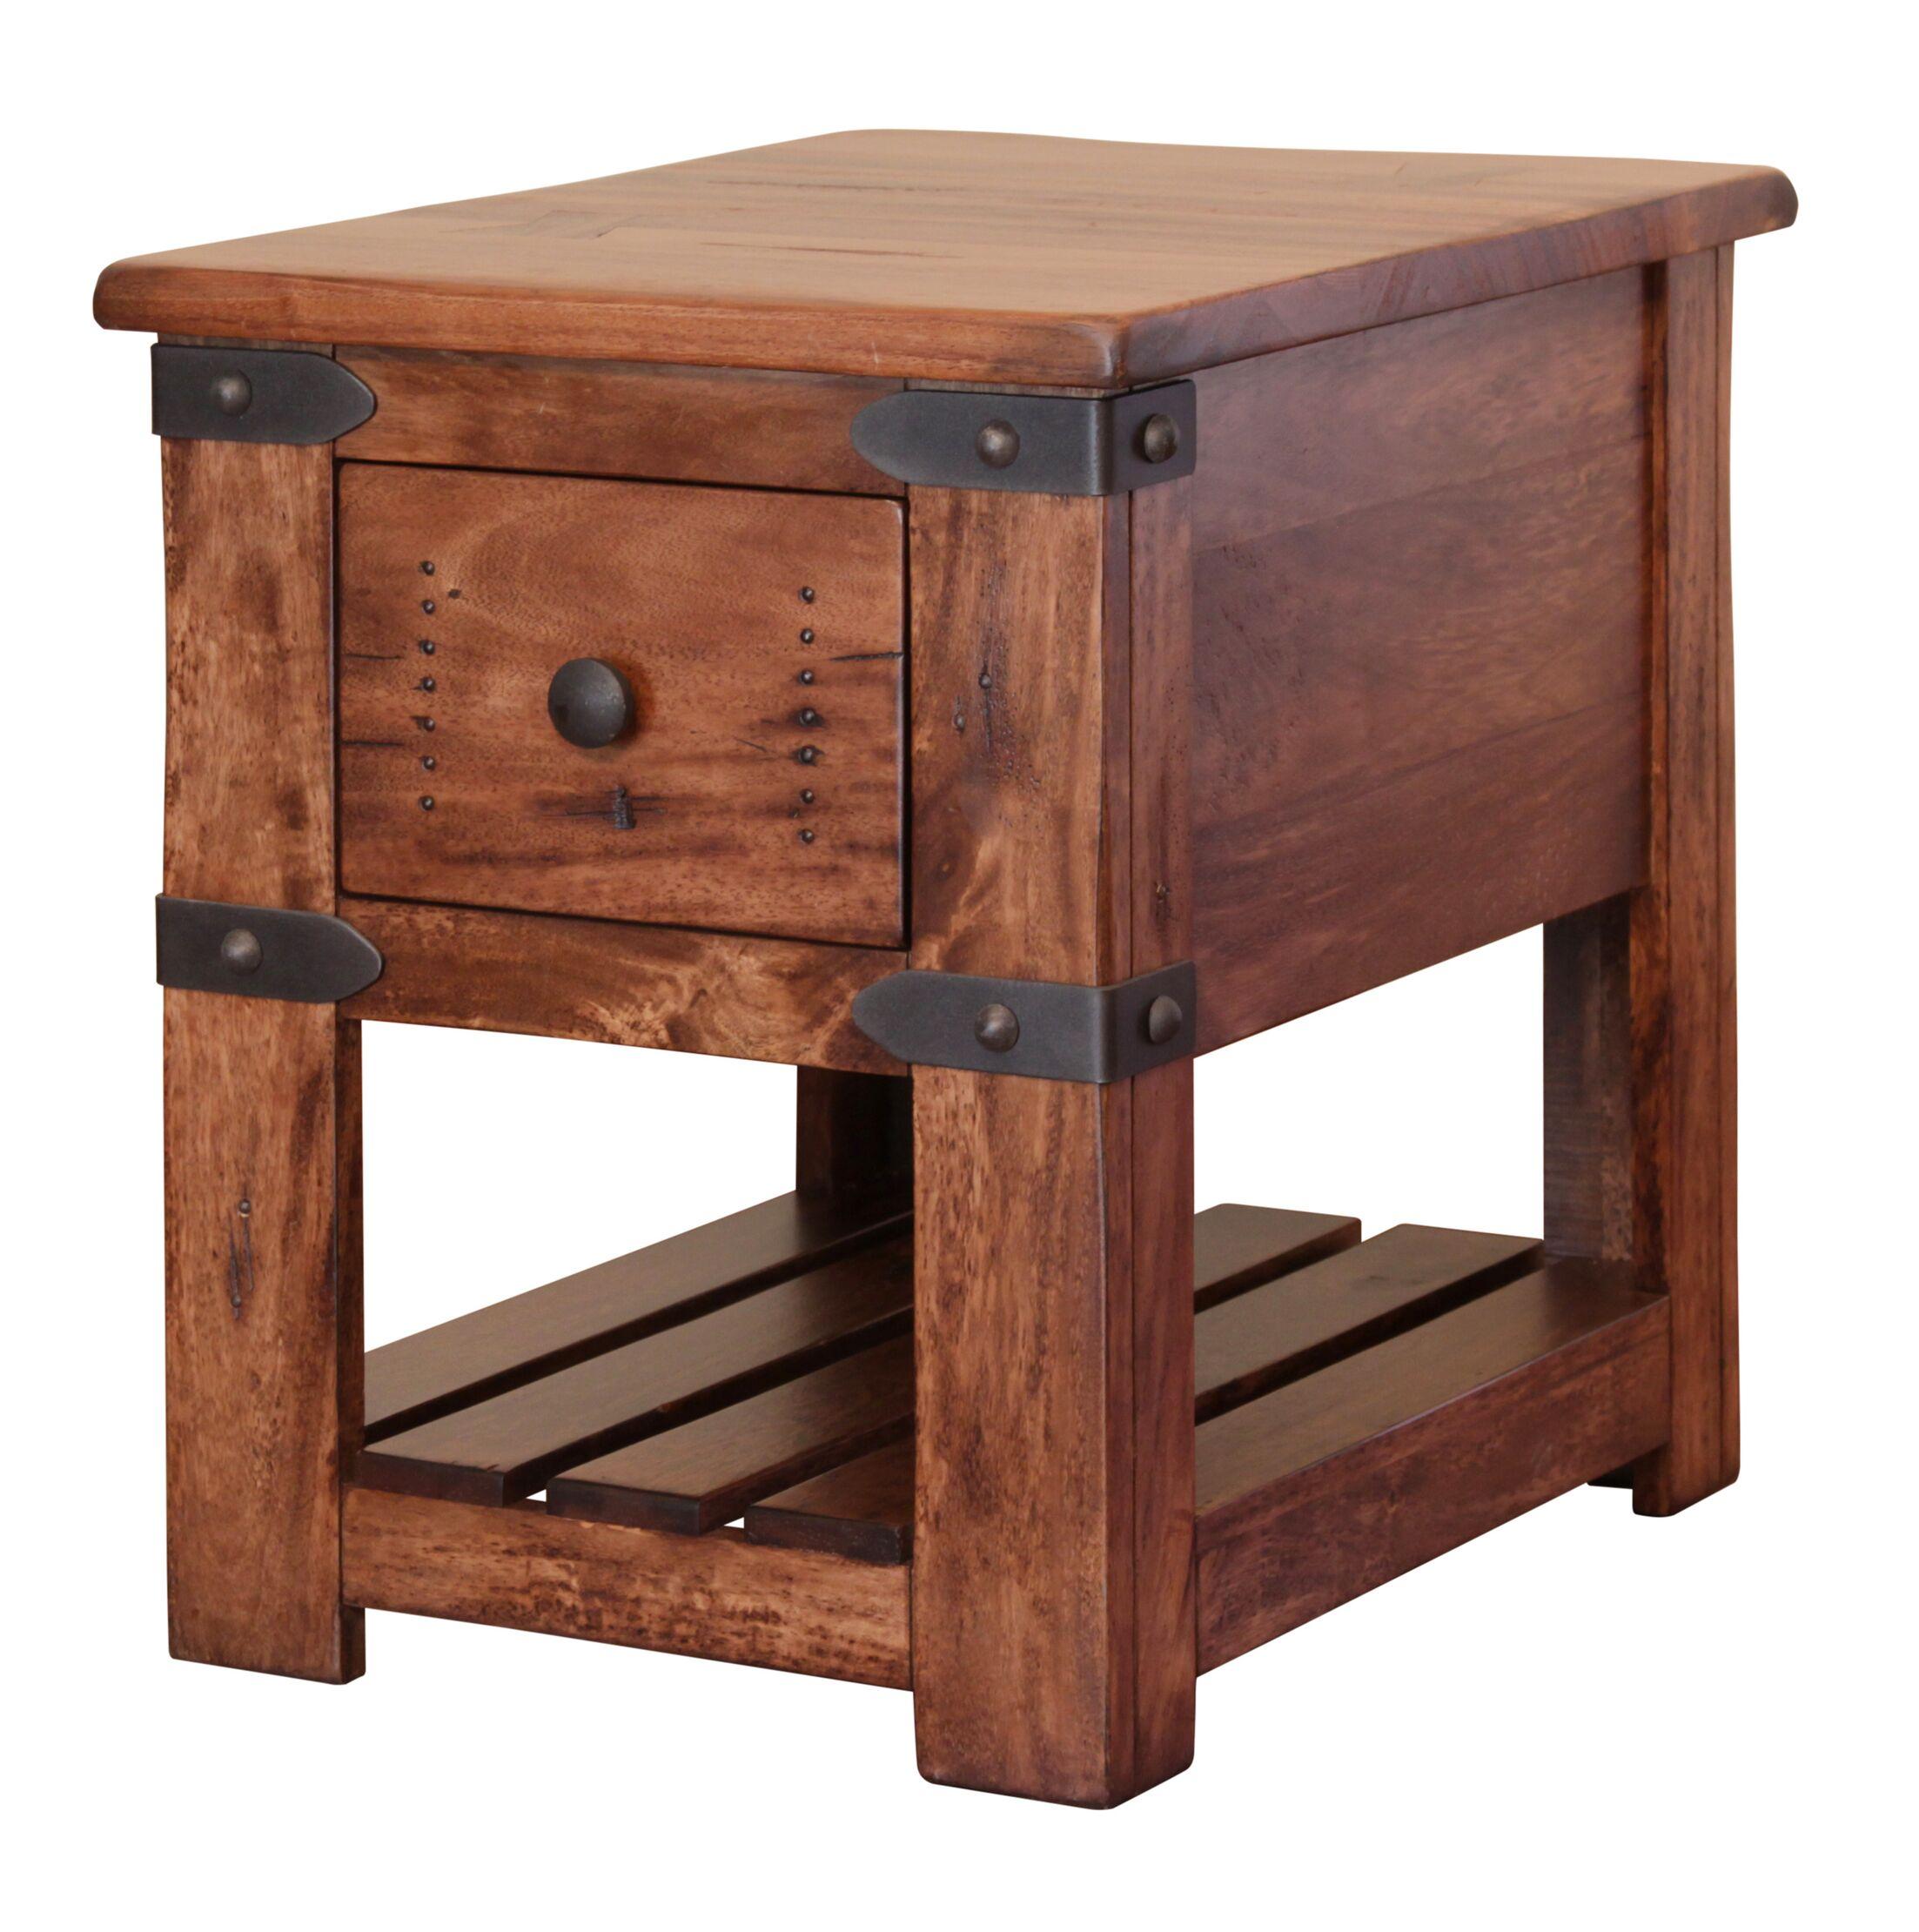 Rockaway 1 Drawer End Table